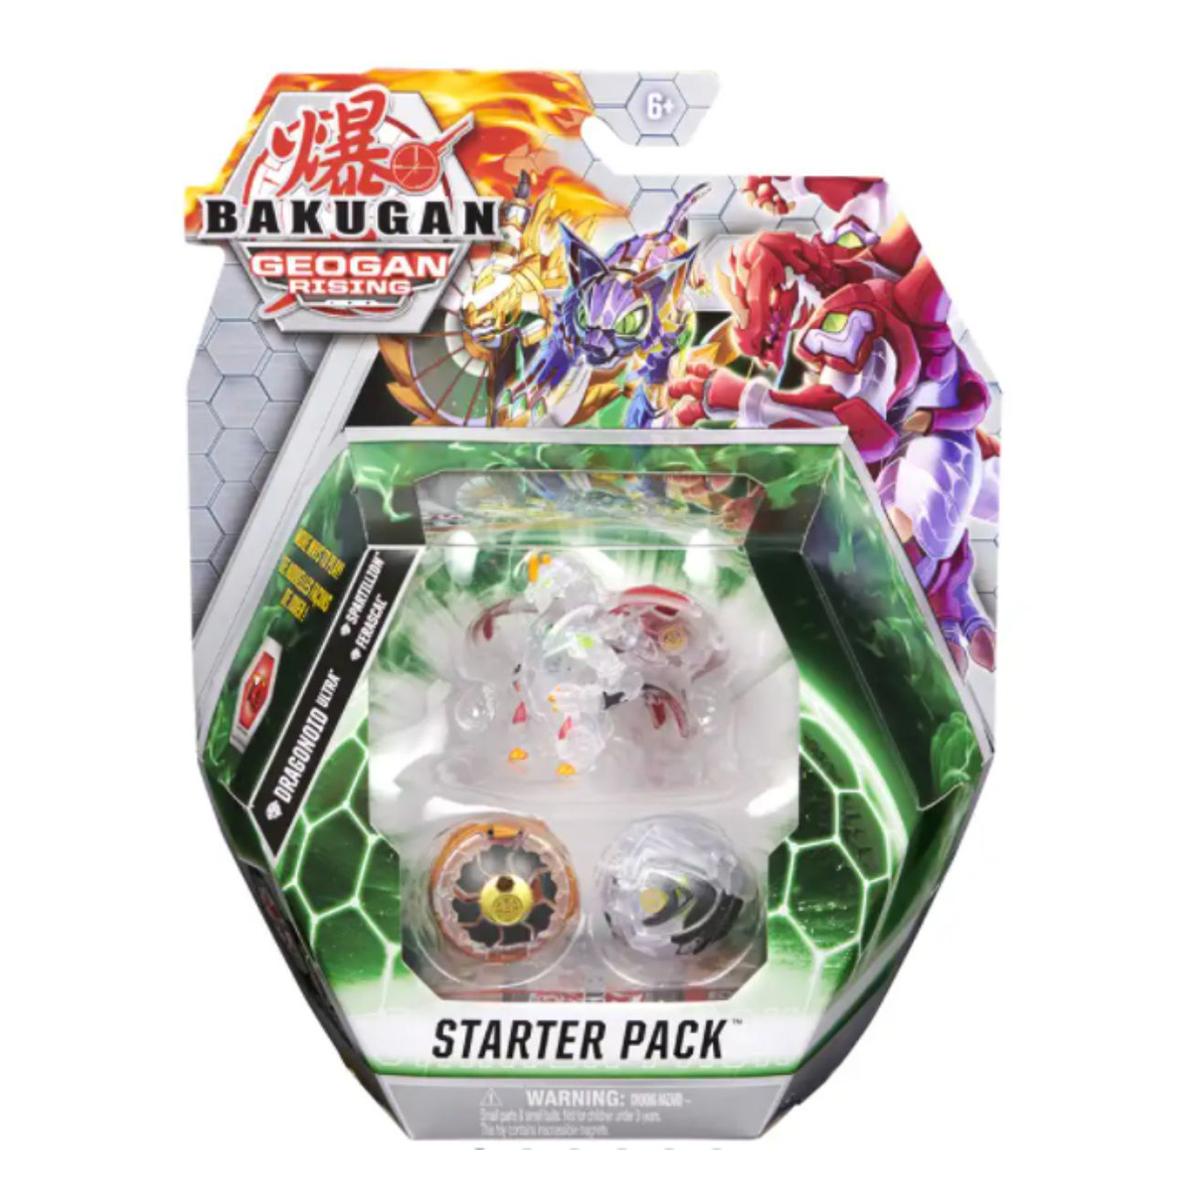 Set Bakugan Geogan Rising, Starter Pack, Dragonoid ultra, Spartillion, Ferascal 20133074